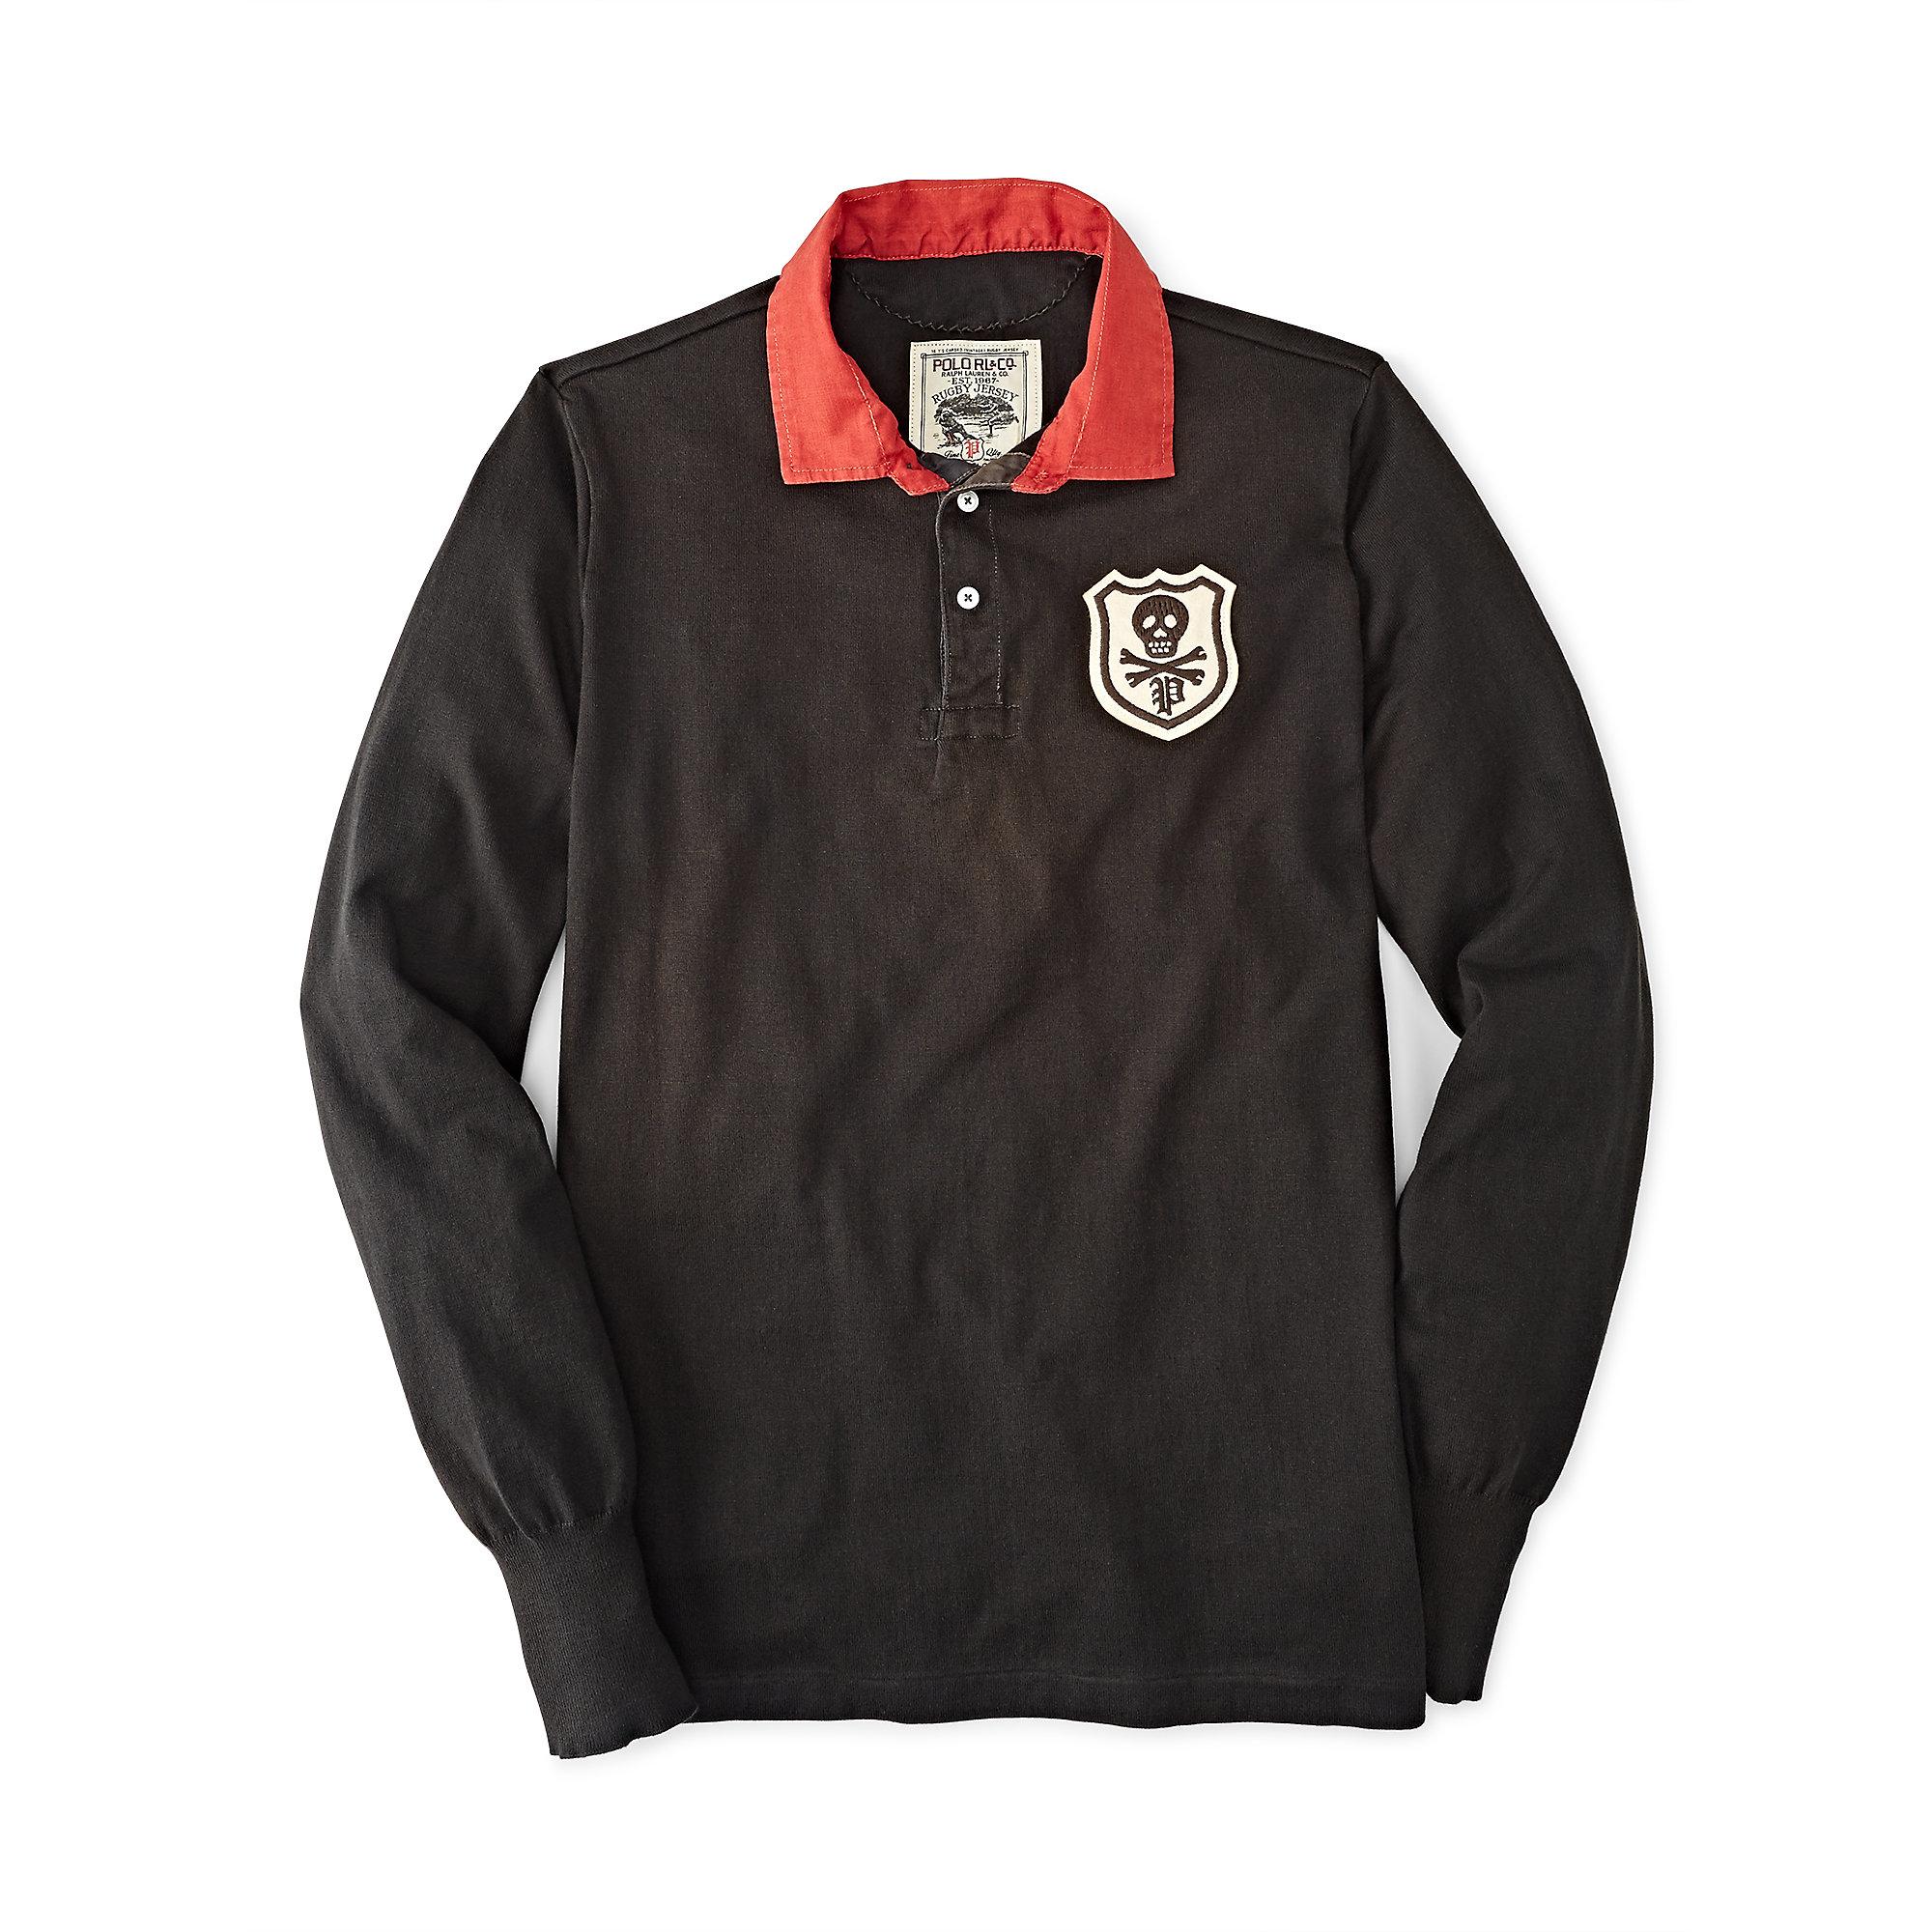 Polo Ralph Lauren Mens Long Sleeve Rugby Shirt Womens Red